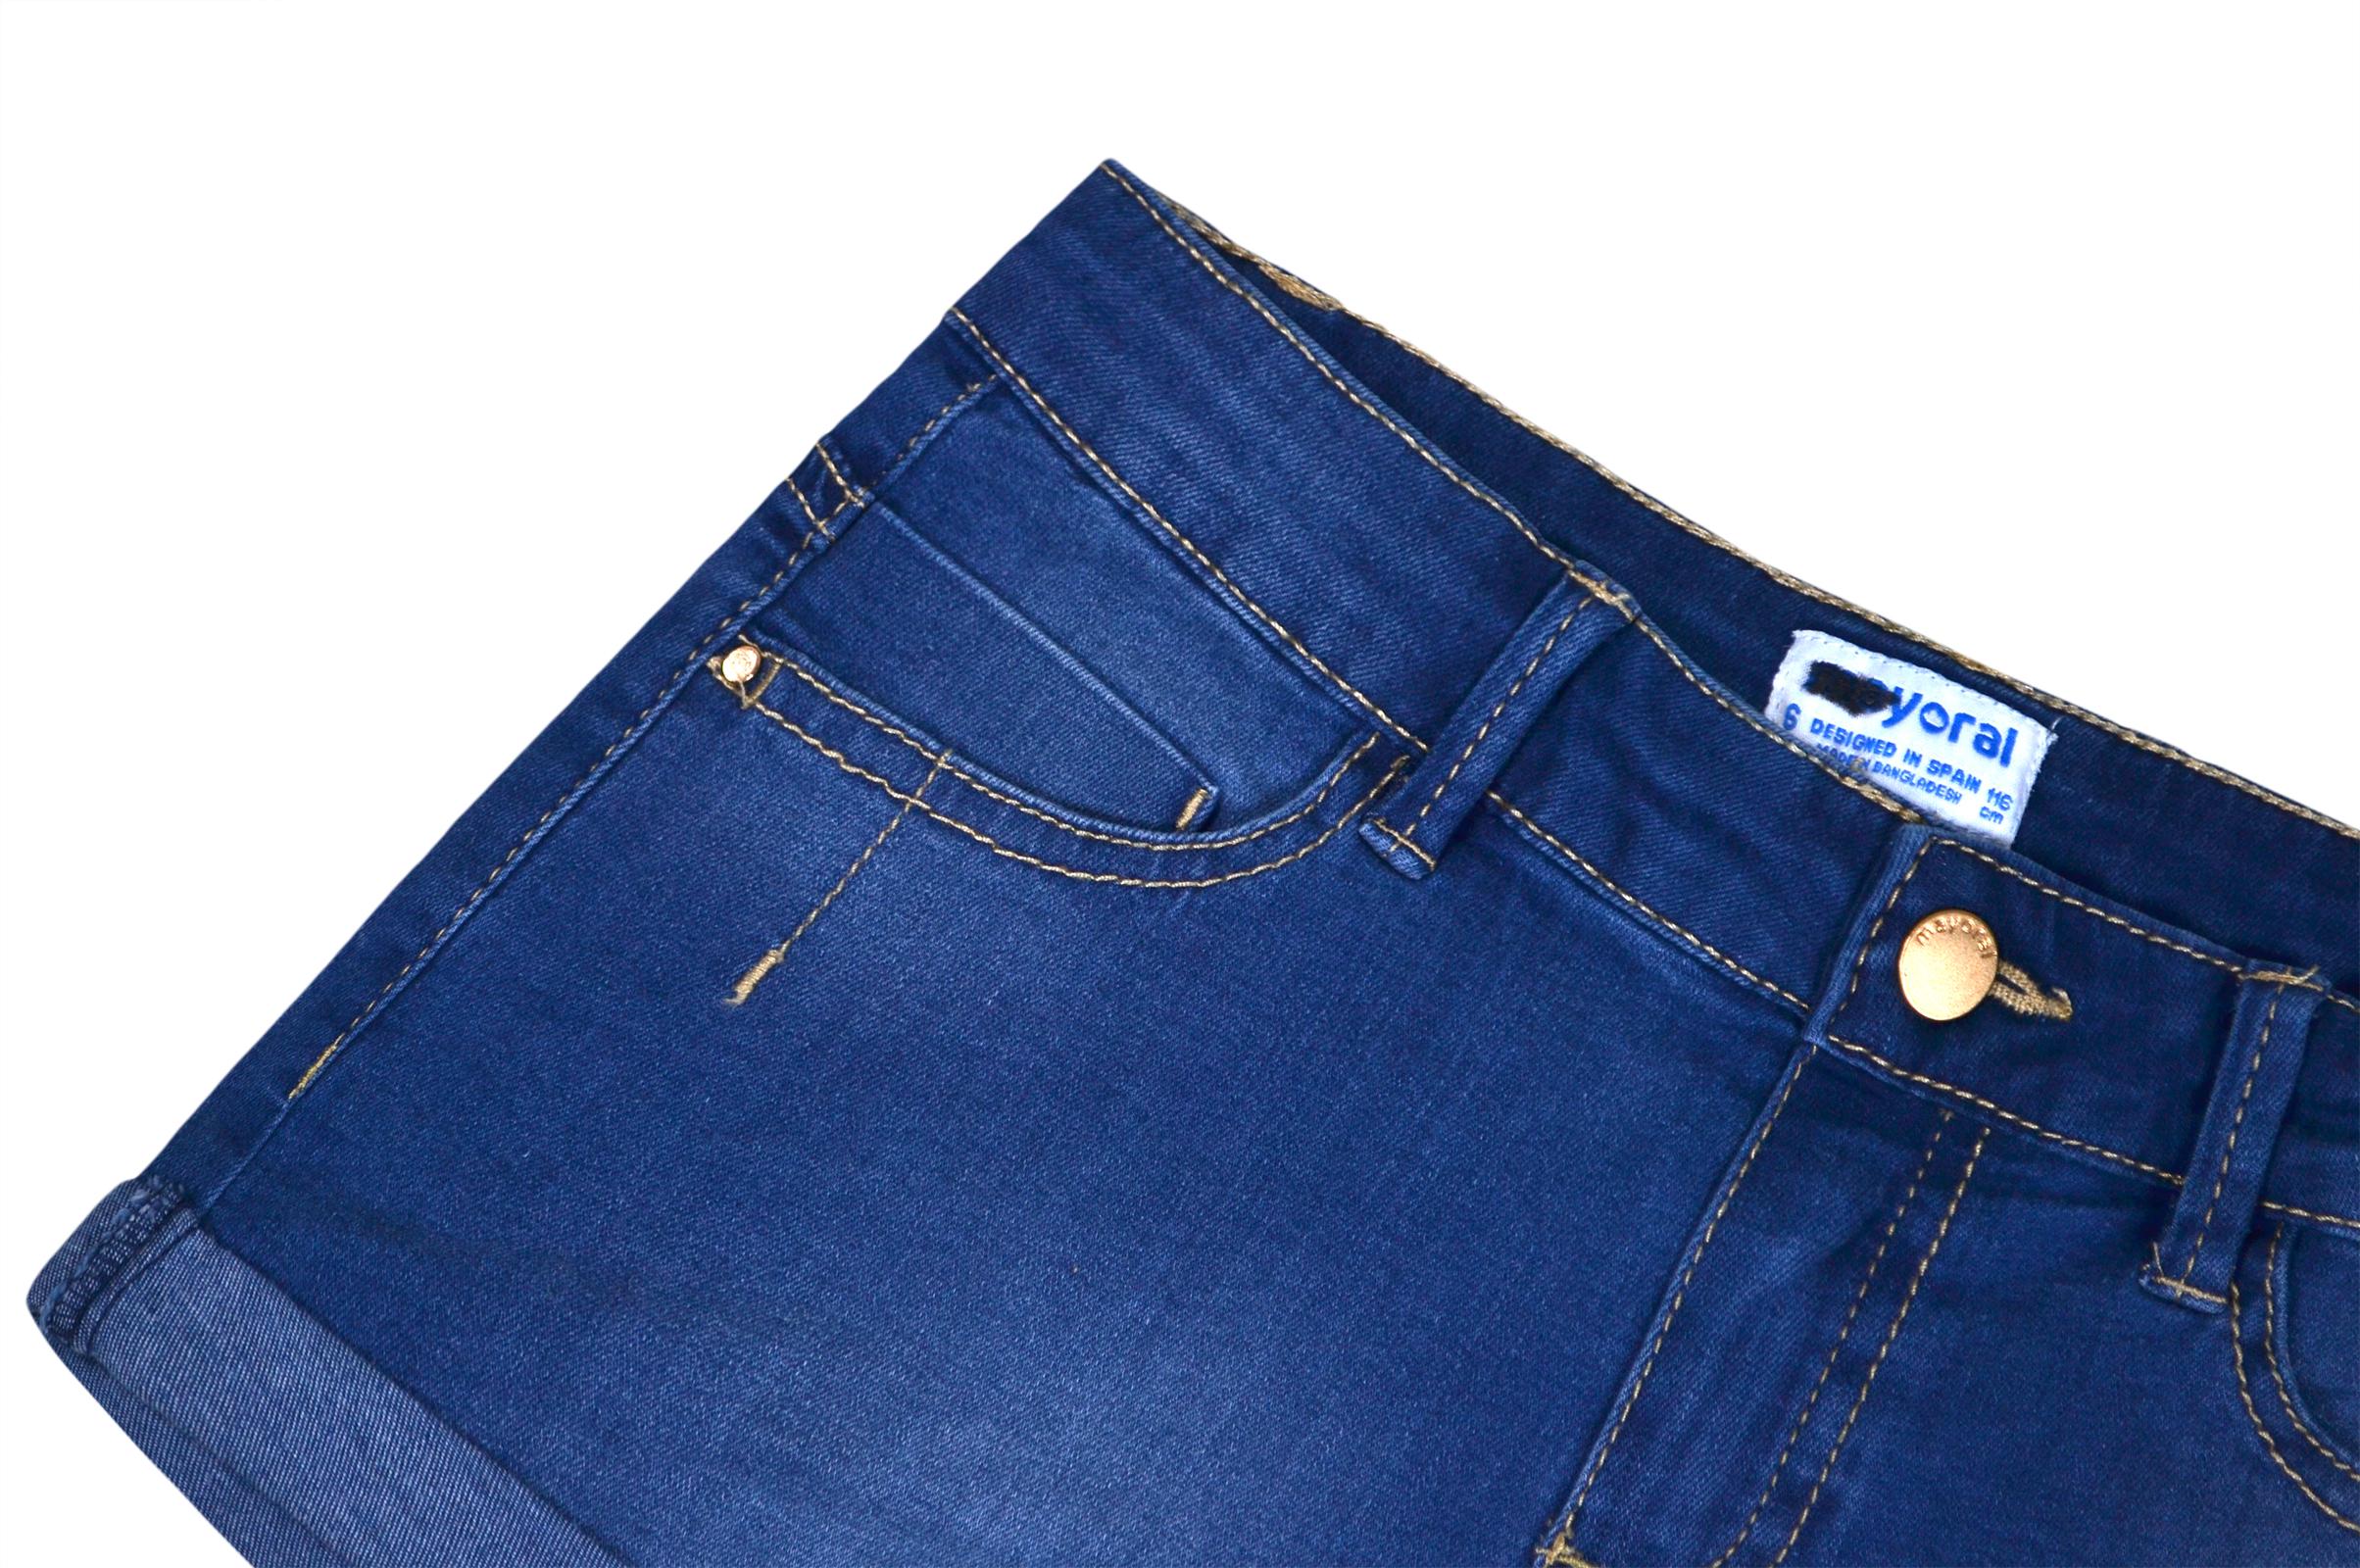 5a97e9084857 Girls Denim Shorts Kids New Summer Jeans Cotton Short Ages 2 3 4 5 6 ...